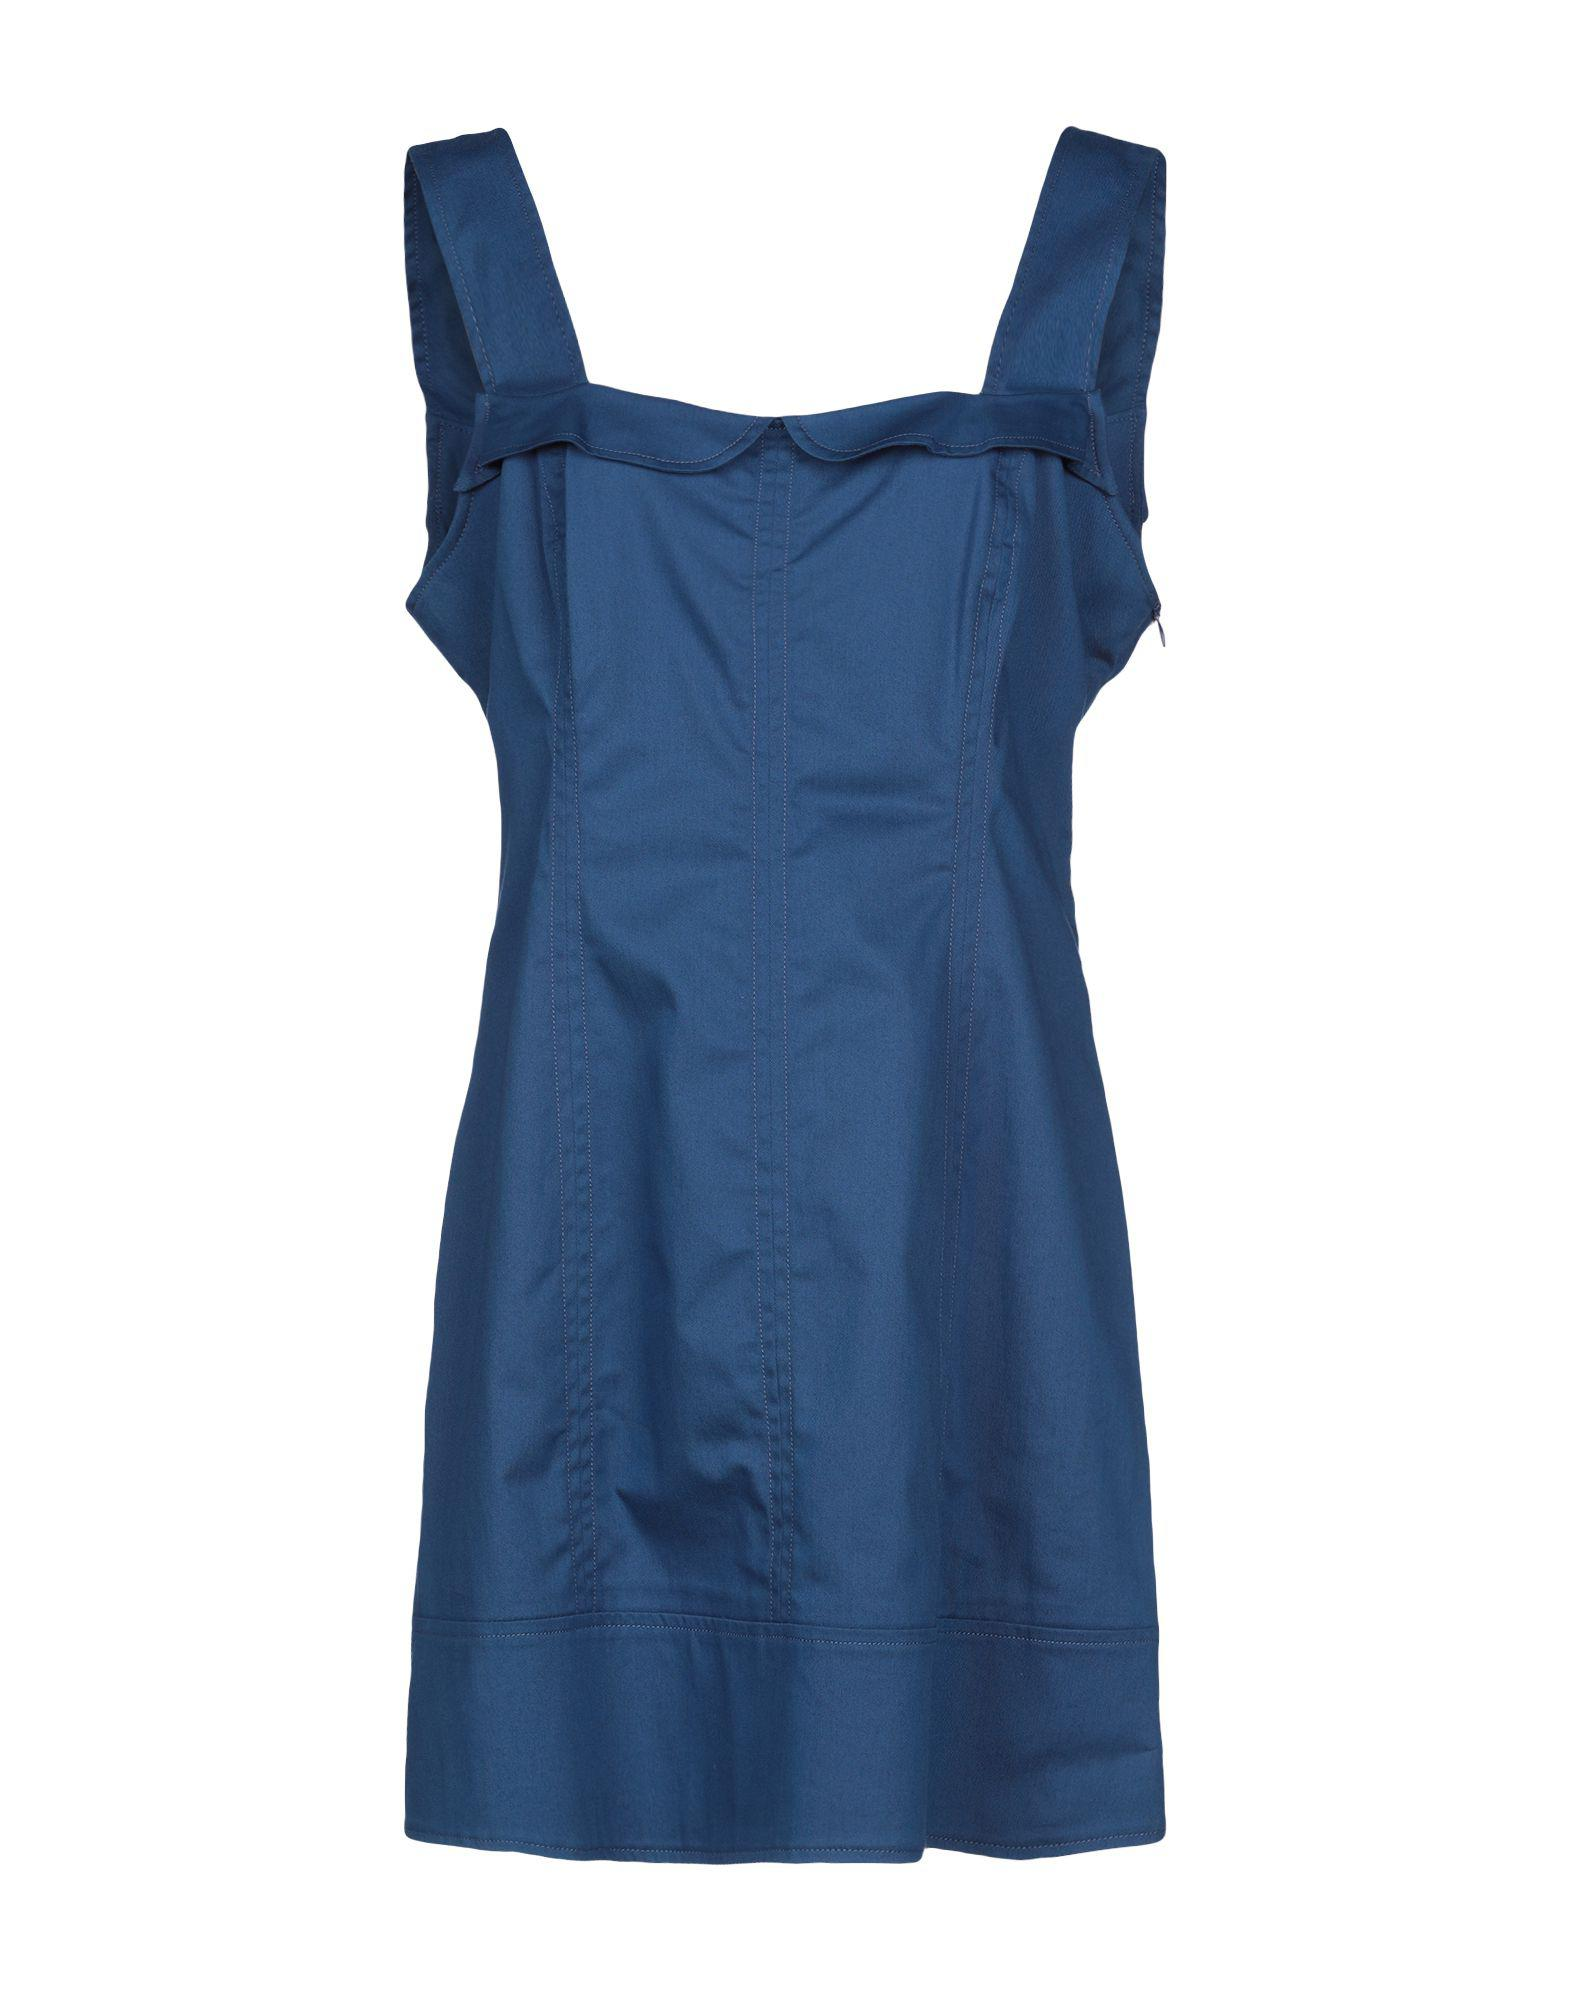 Lyst - Rocco Barocco Short Dress in Blue a78f937263d